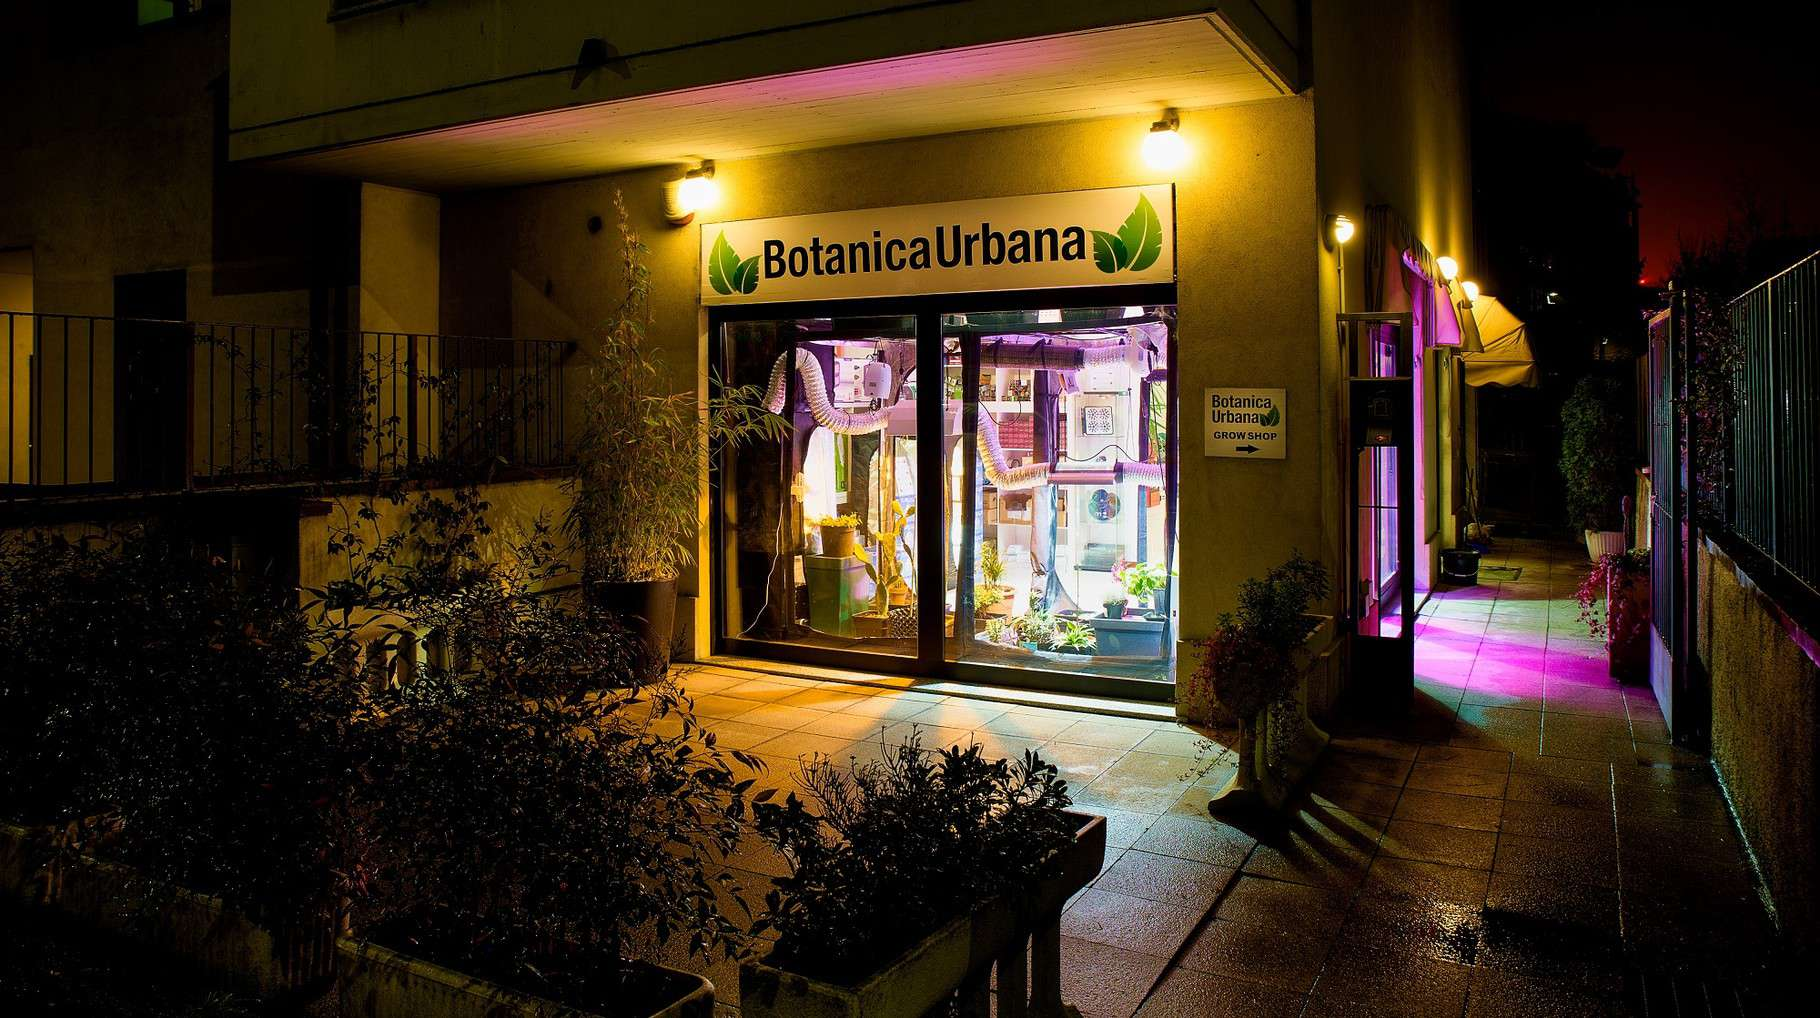 Botanica Urbana GrowShop Milano